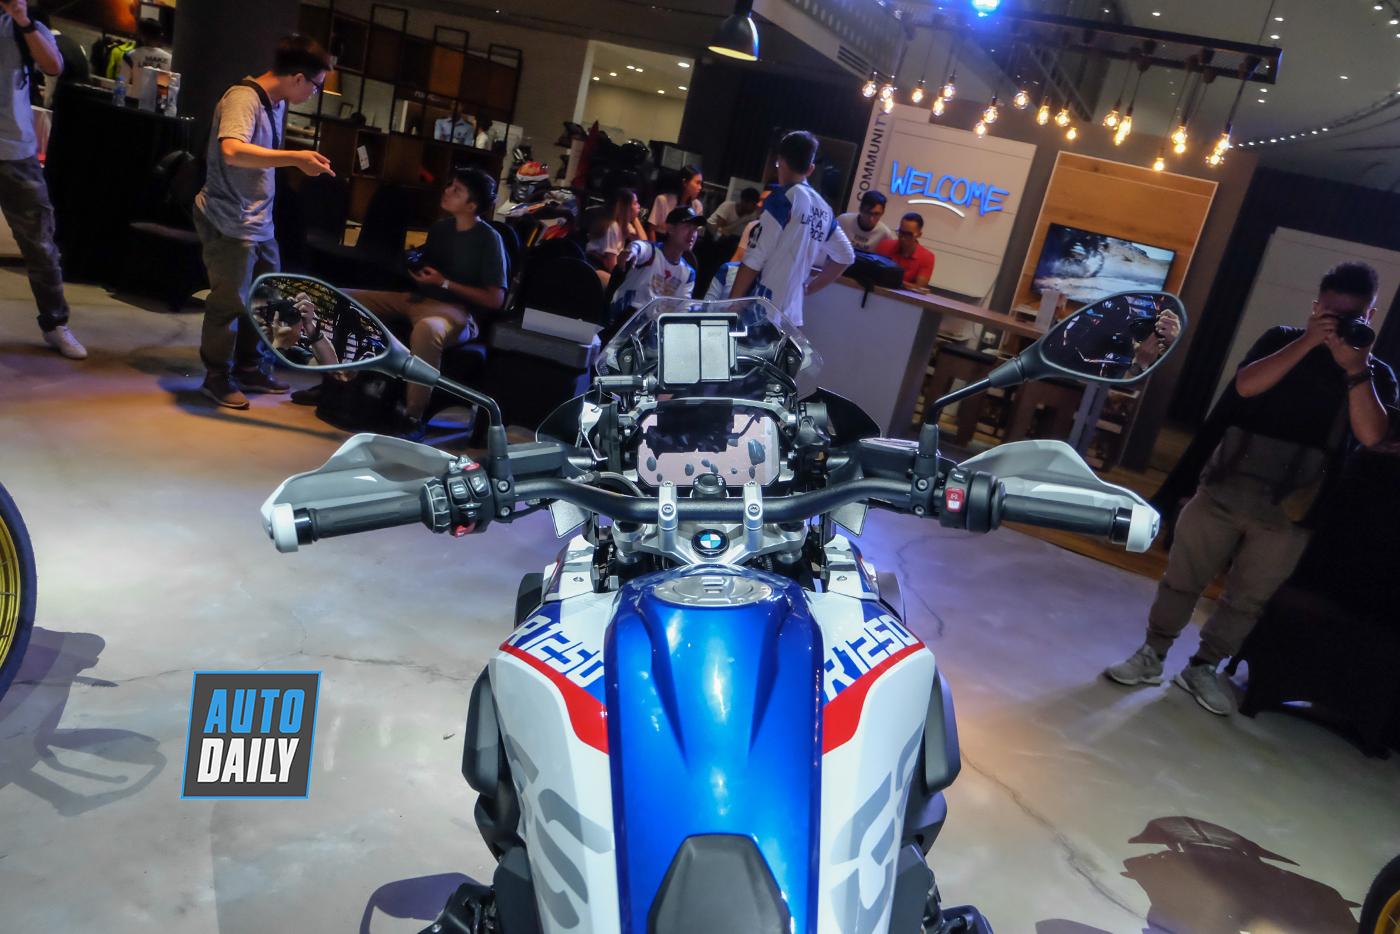 bmw-motorrad-r-1250-gs-2019-24.jpg